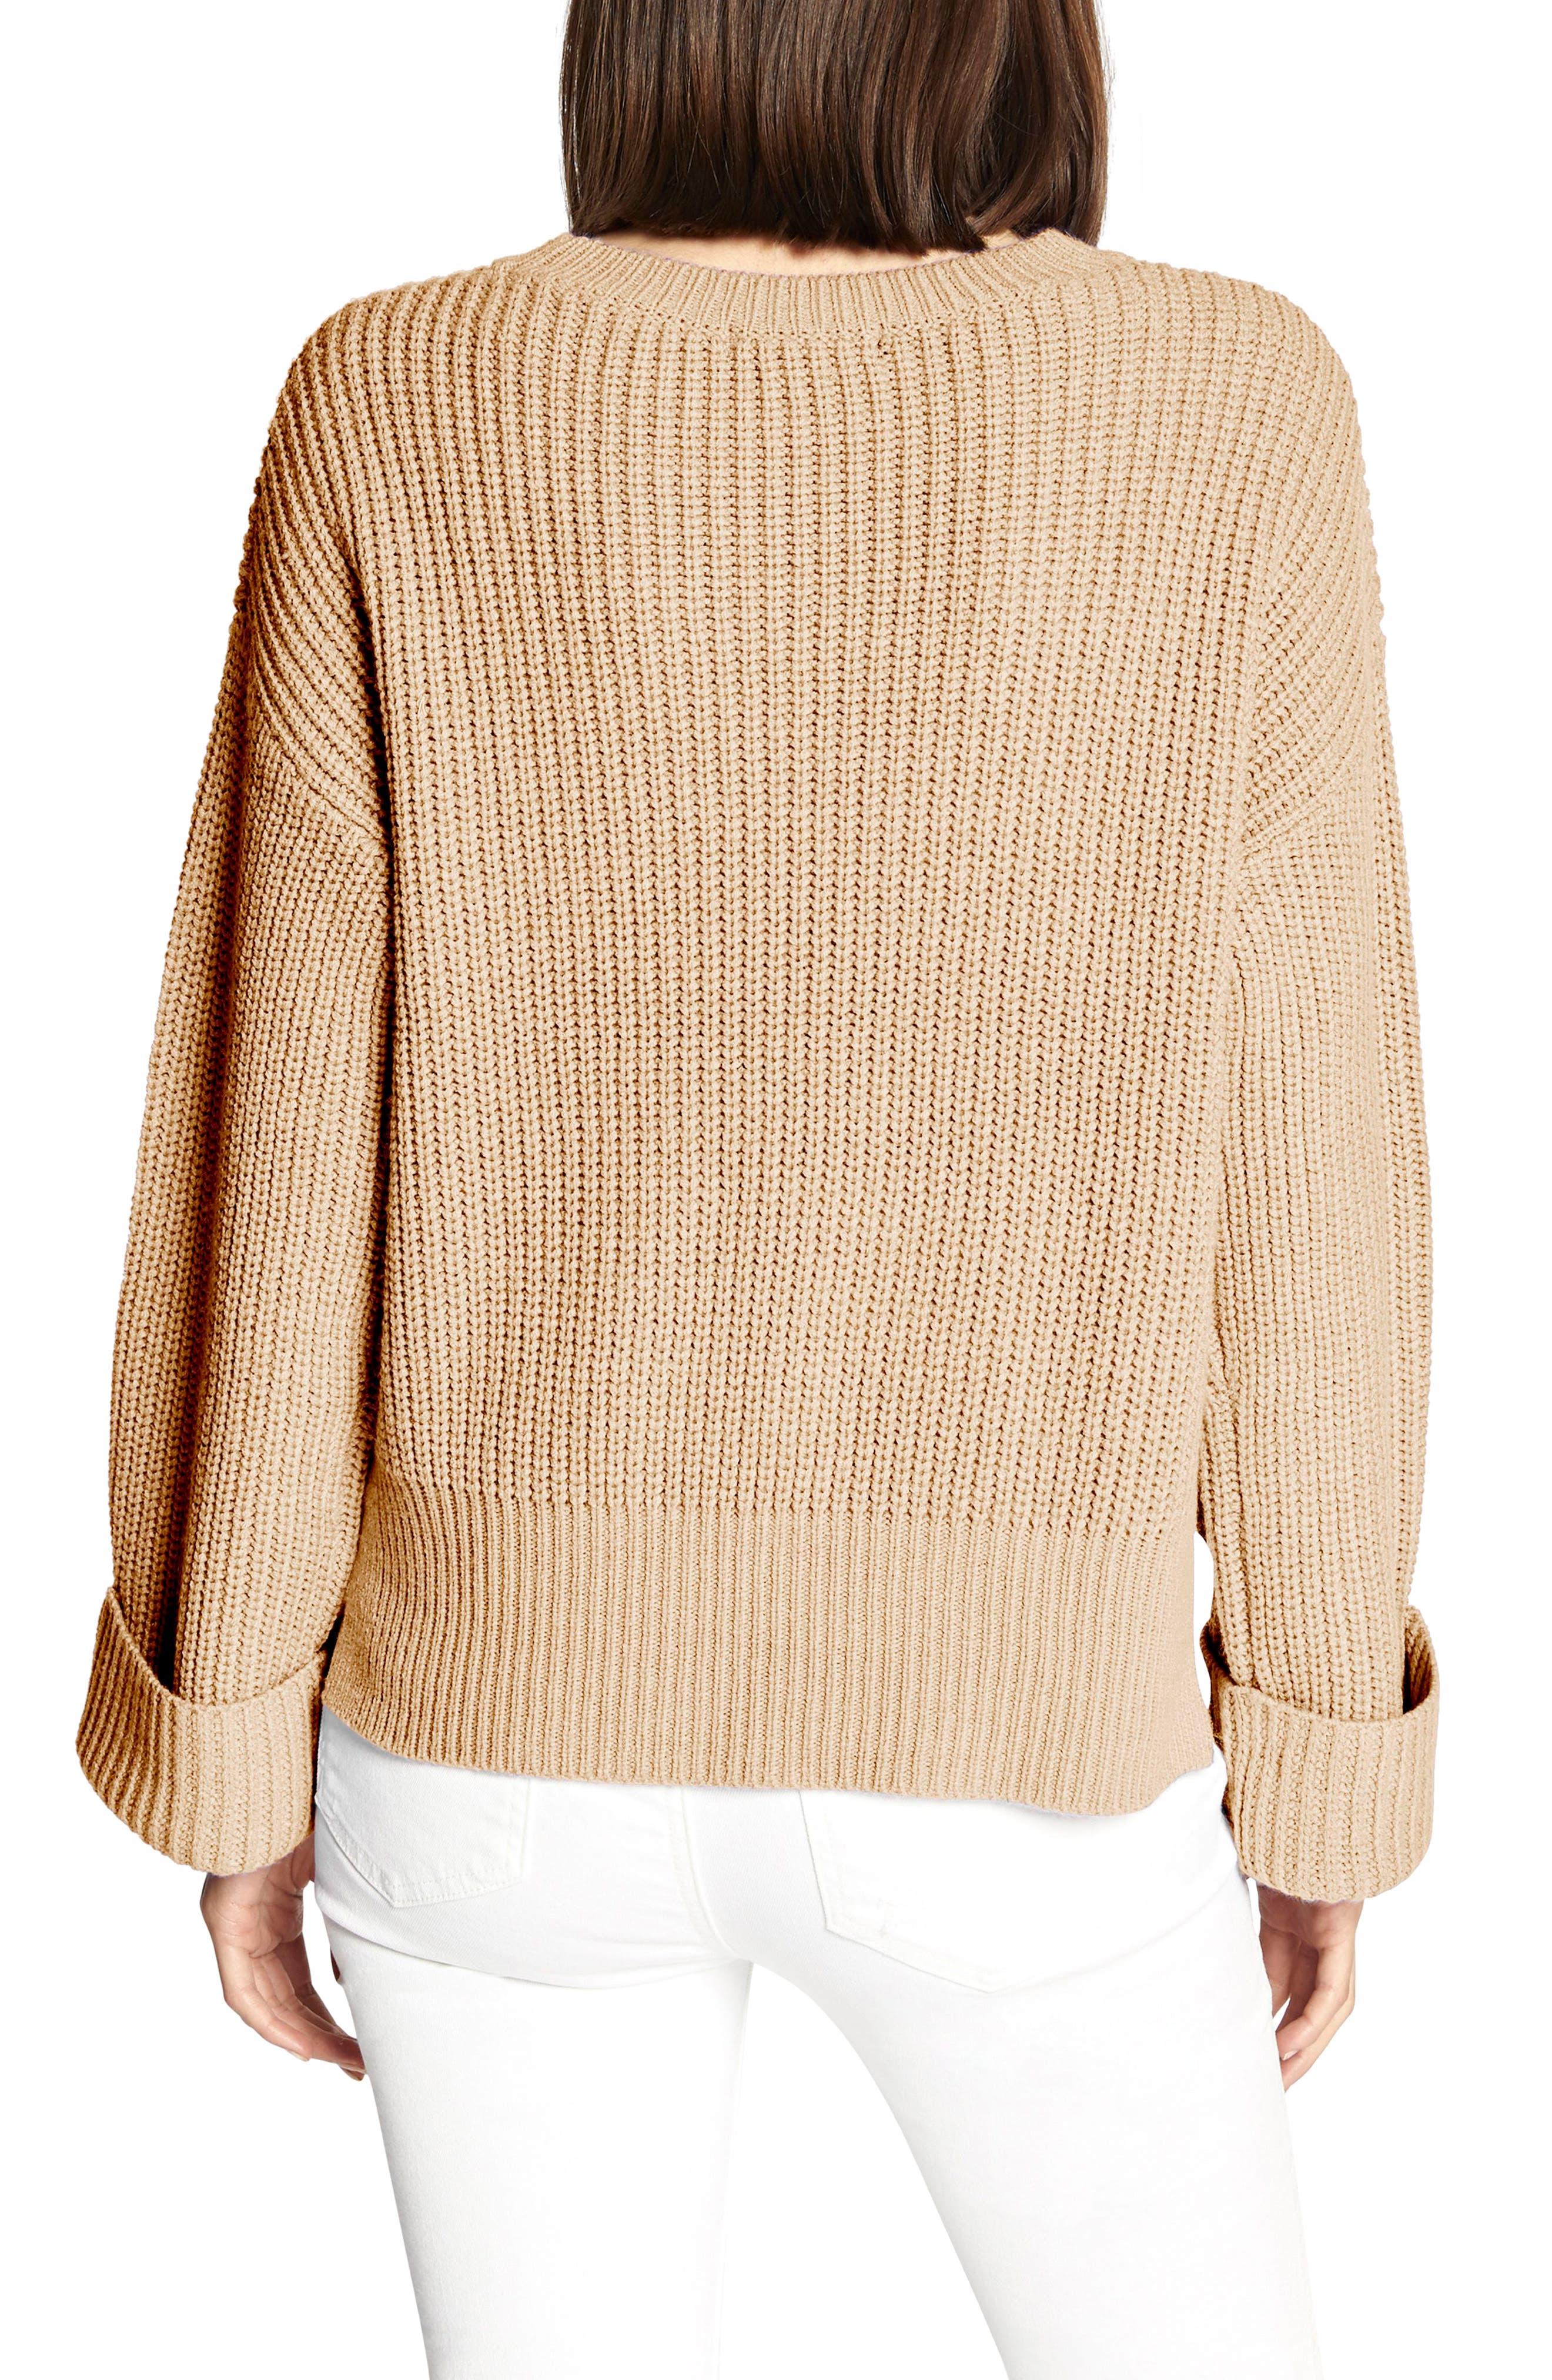 Bell Sleeve Shaker Sweater,                             Alternate thumbnail 2, color,                             CHAMPAGNE